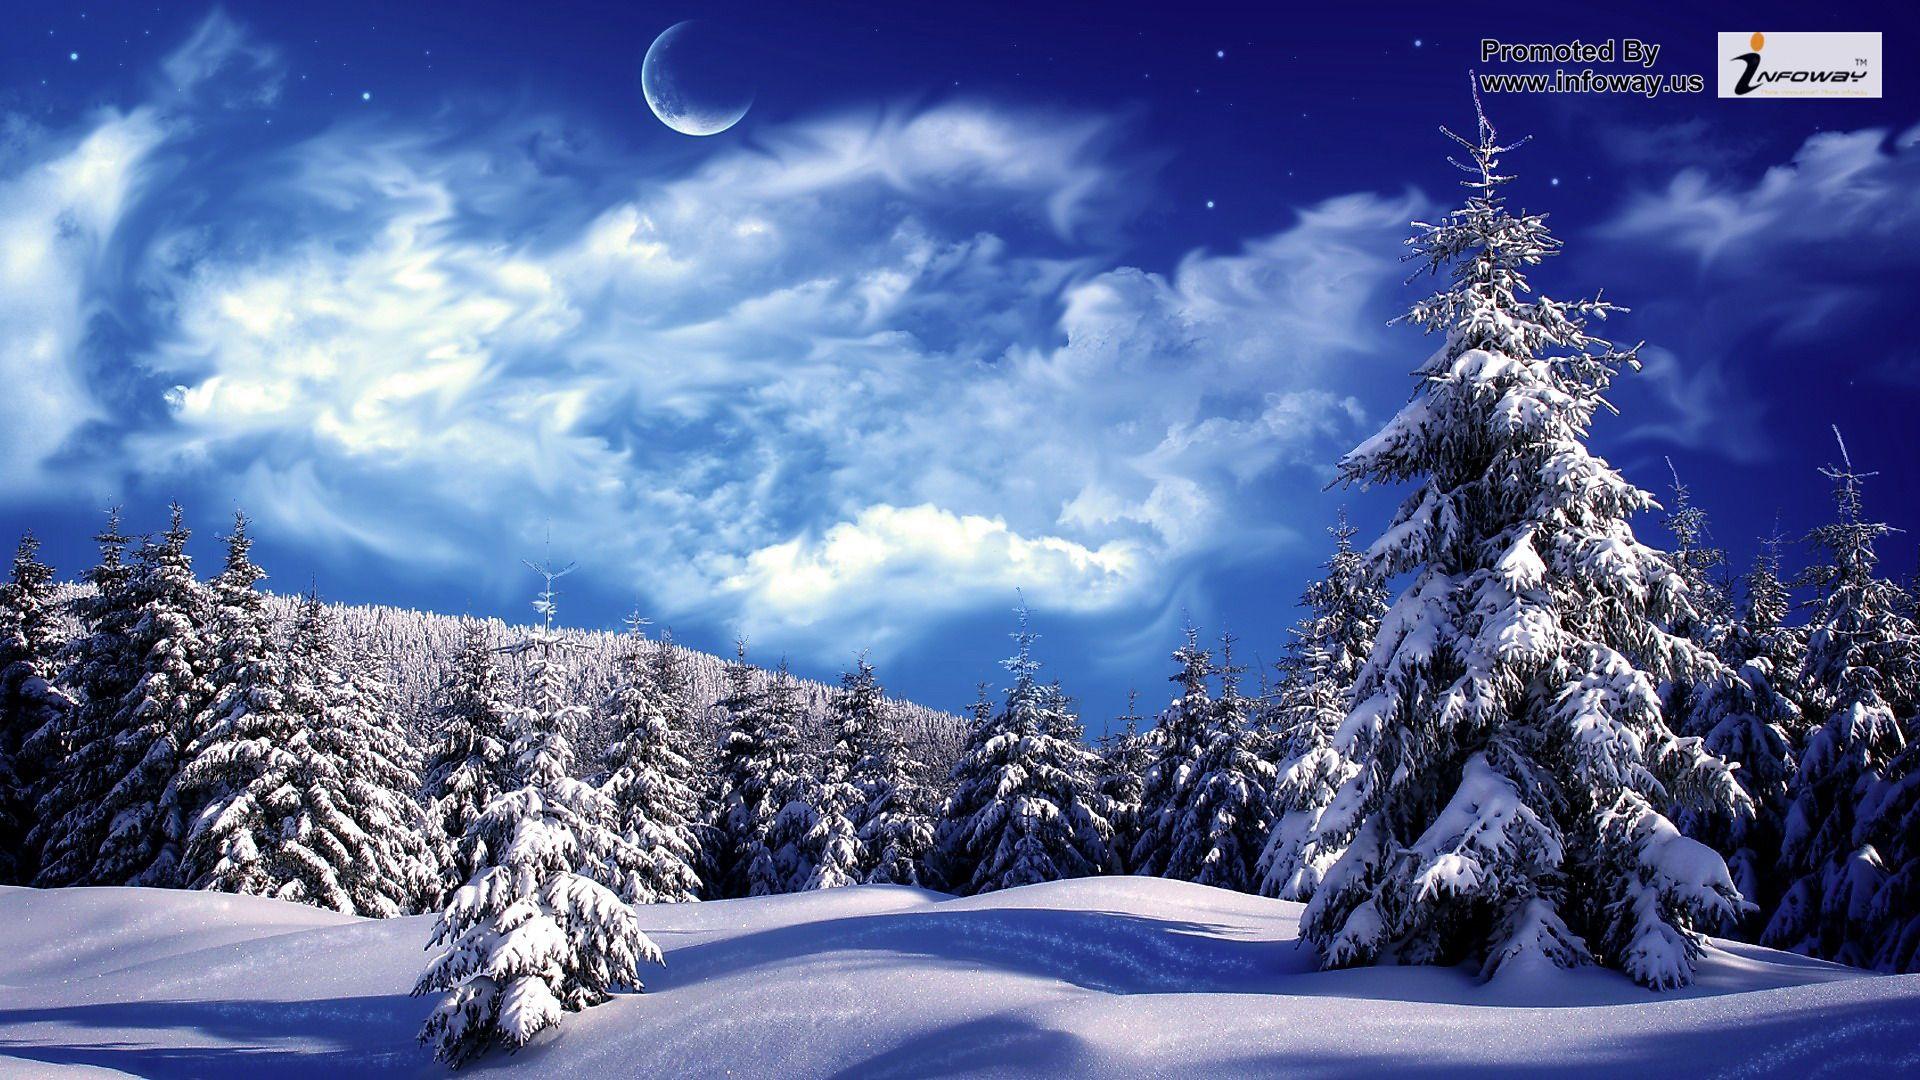 hd wallpapers snowy wonderland mountain scene sky snow trees 1920x1080 1920x1080